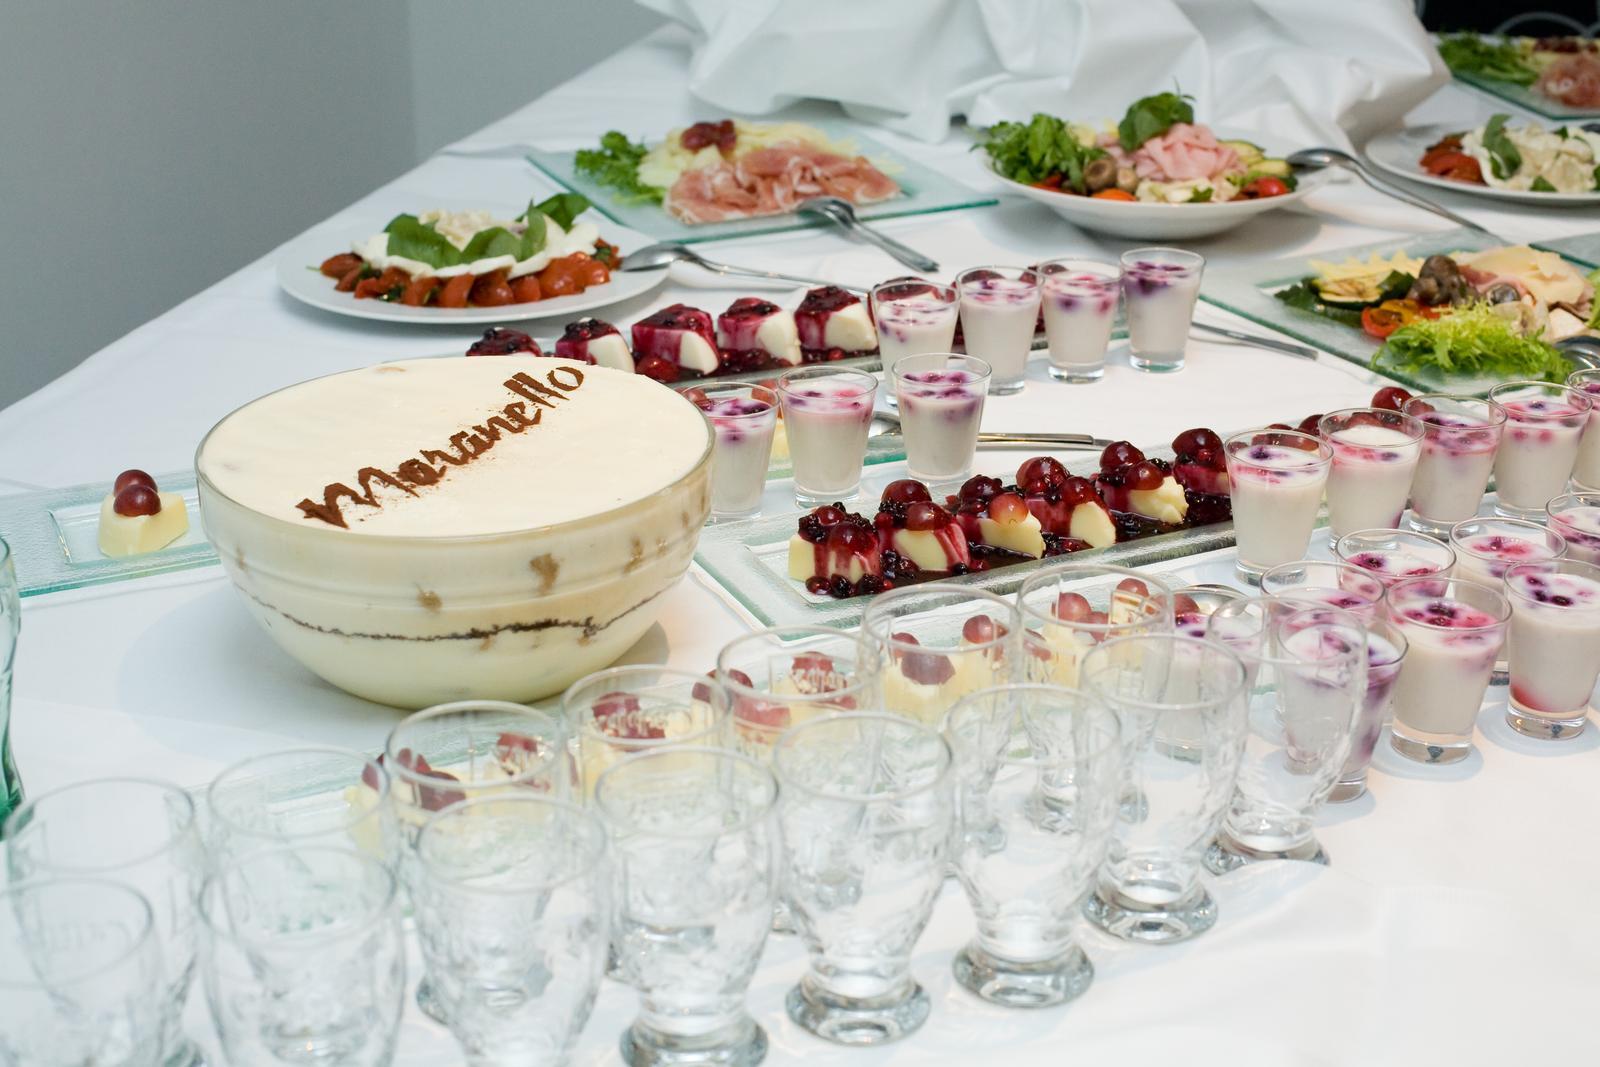 Svadba by Happy-Day catering - Obrázok č. 3